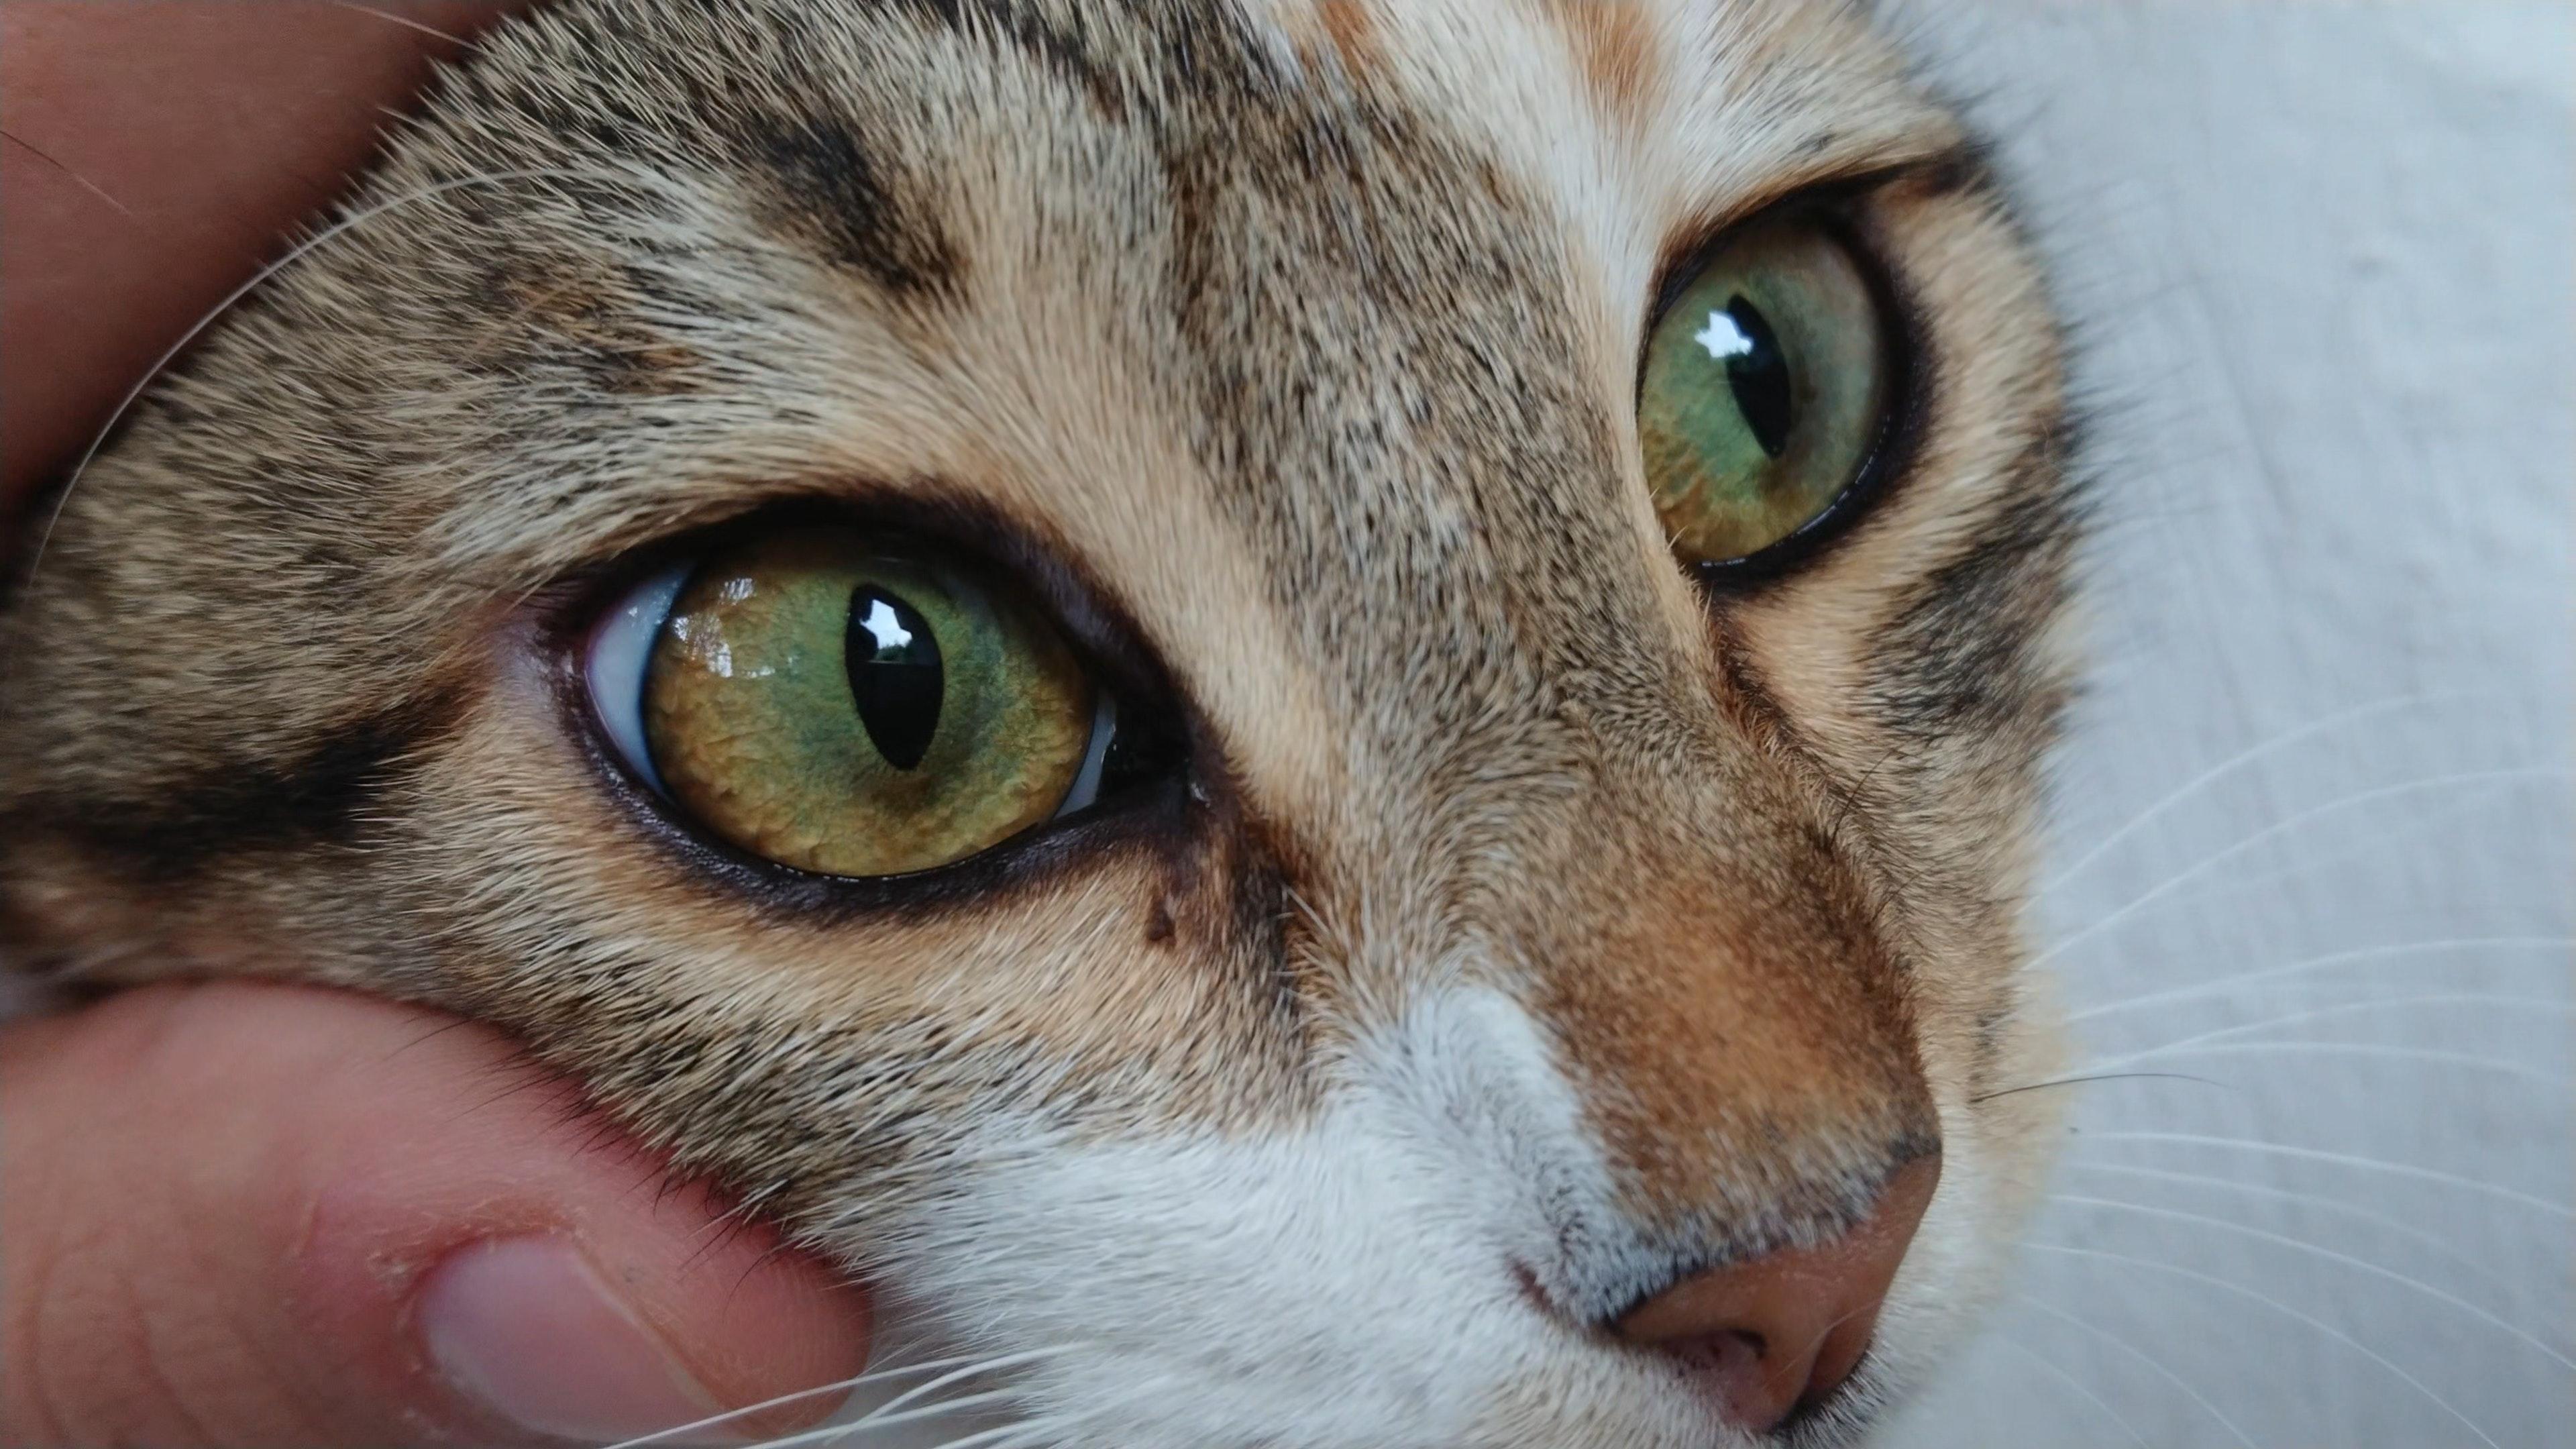 Free stock photo of cat eye, cat face, cute animals